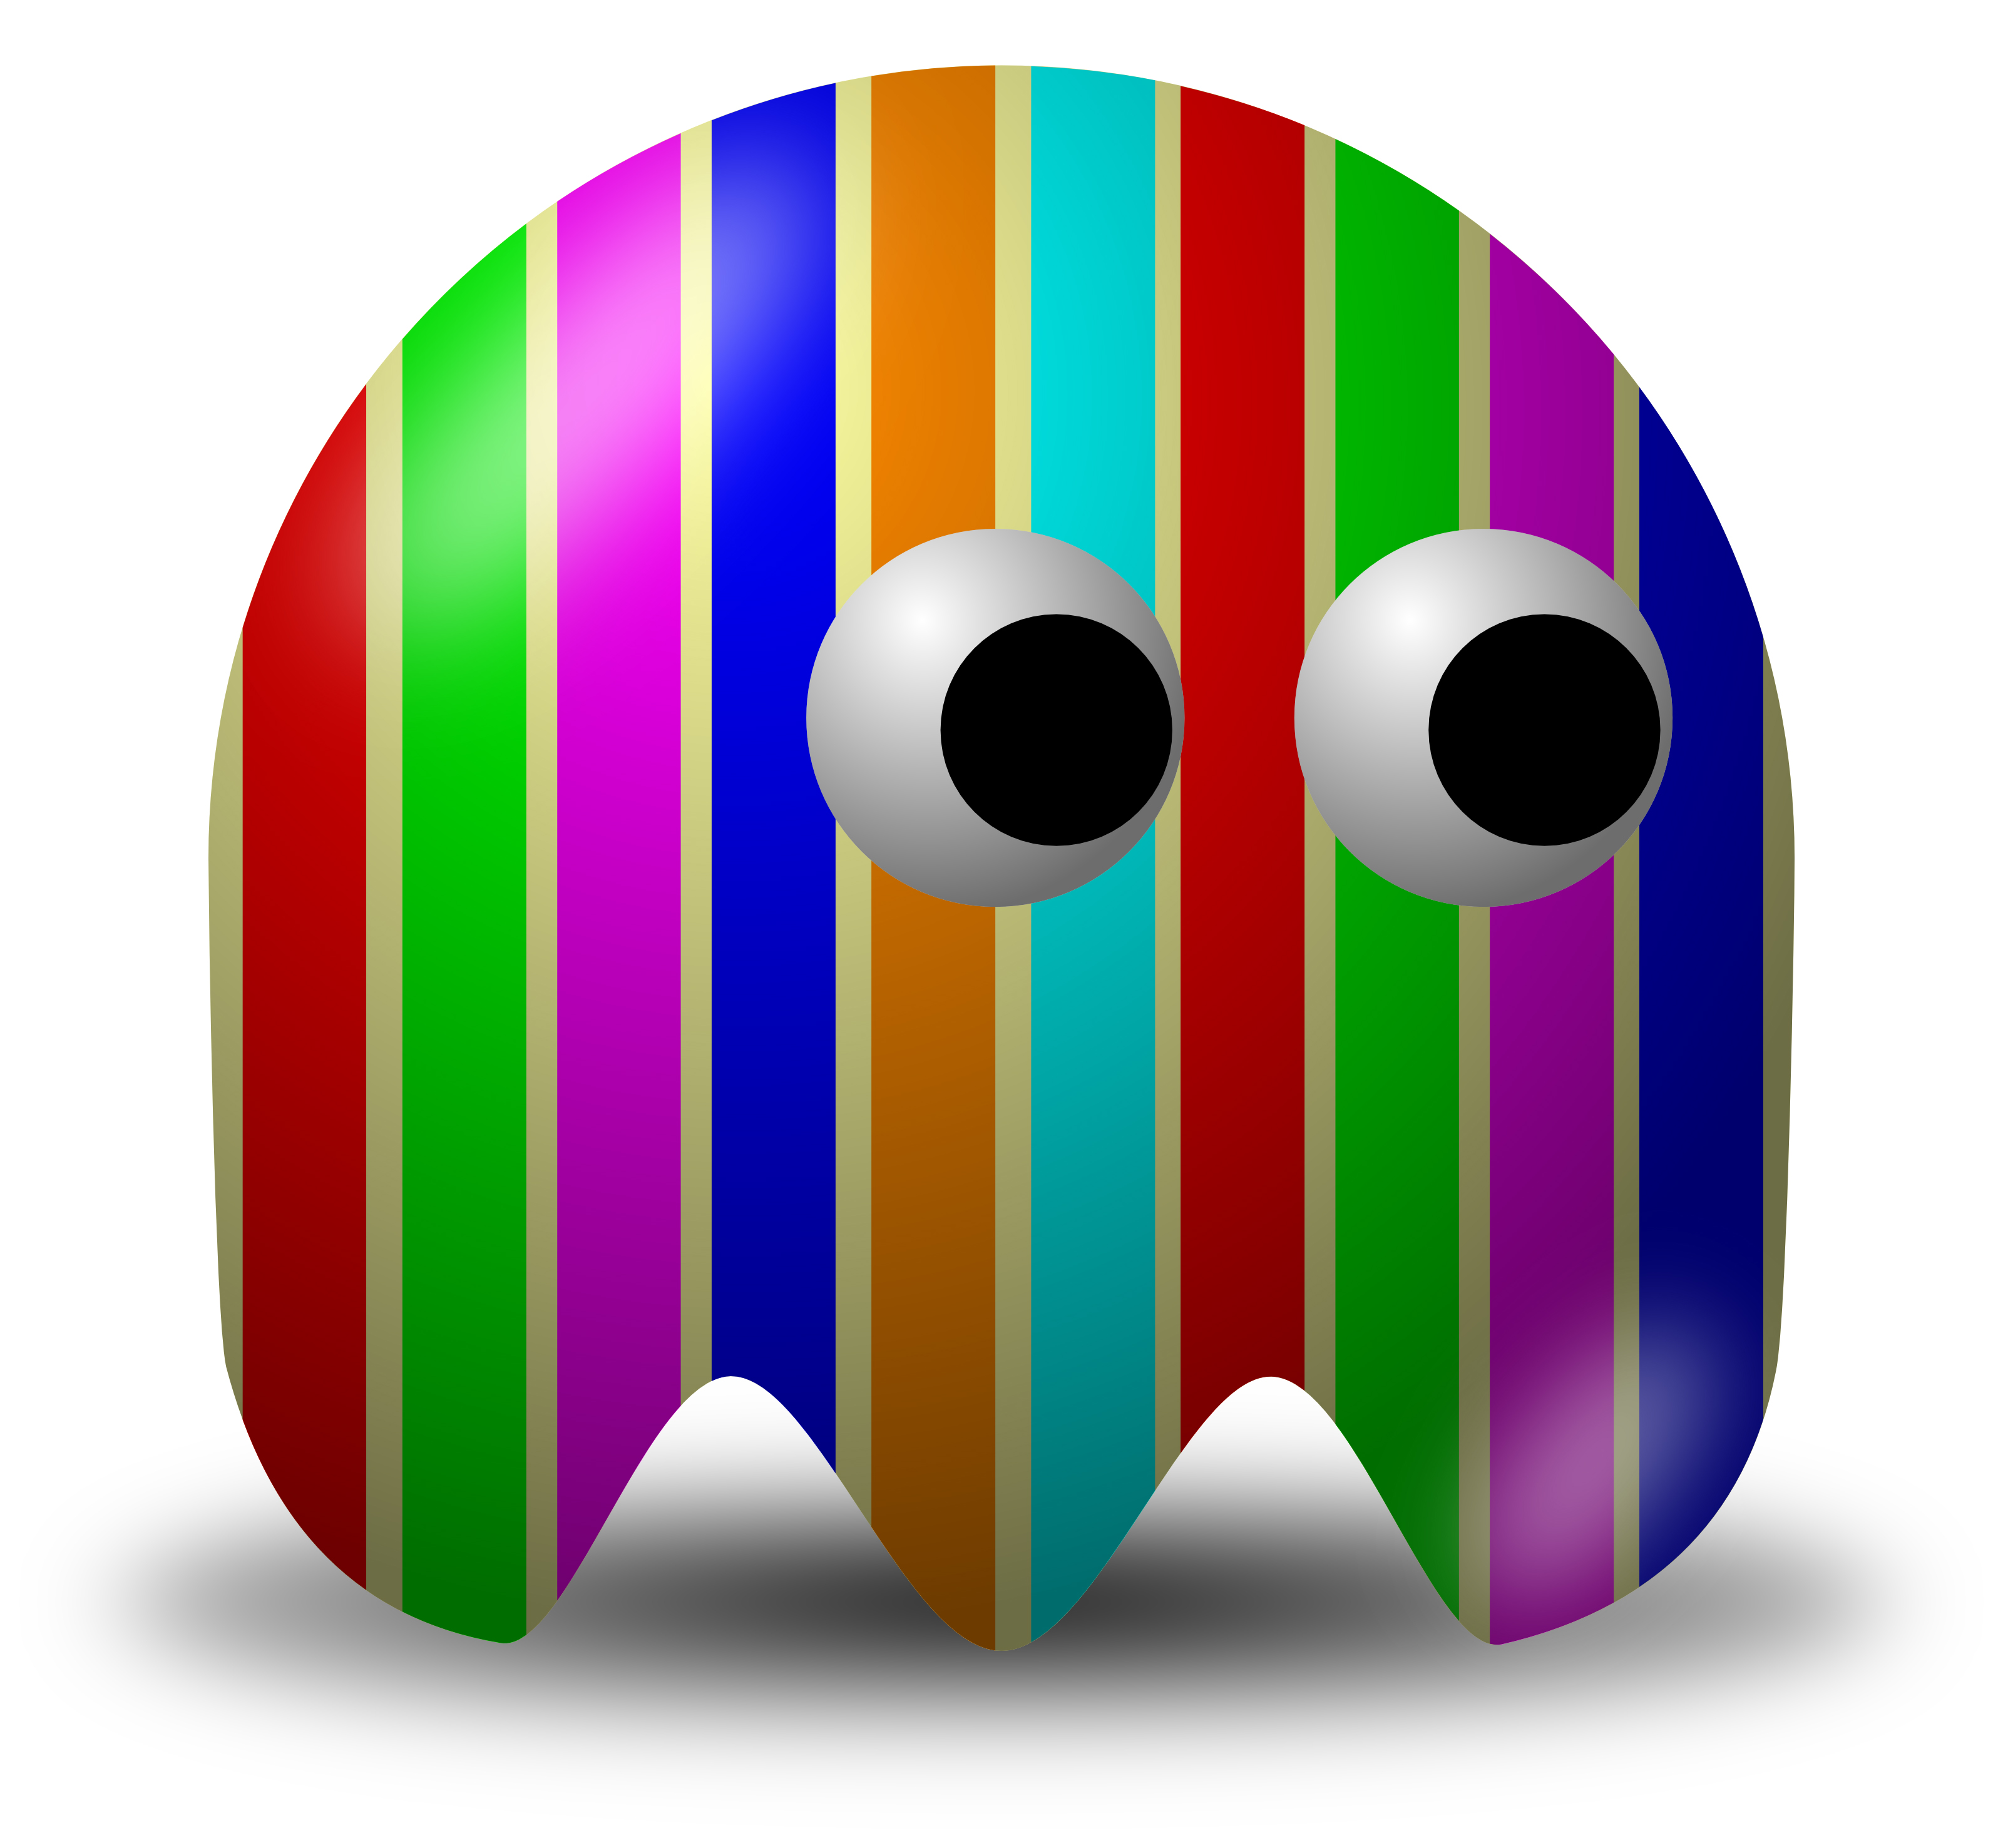 Avatar Clipart Clipart Panda Free Clipart Images #kFhRzu - Clipart Kid